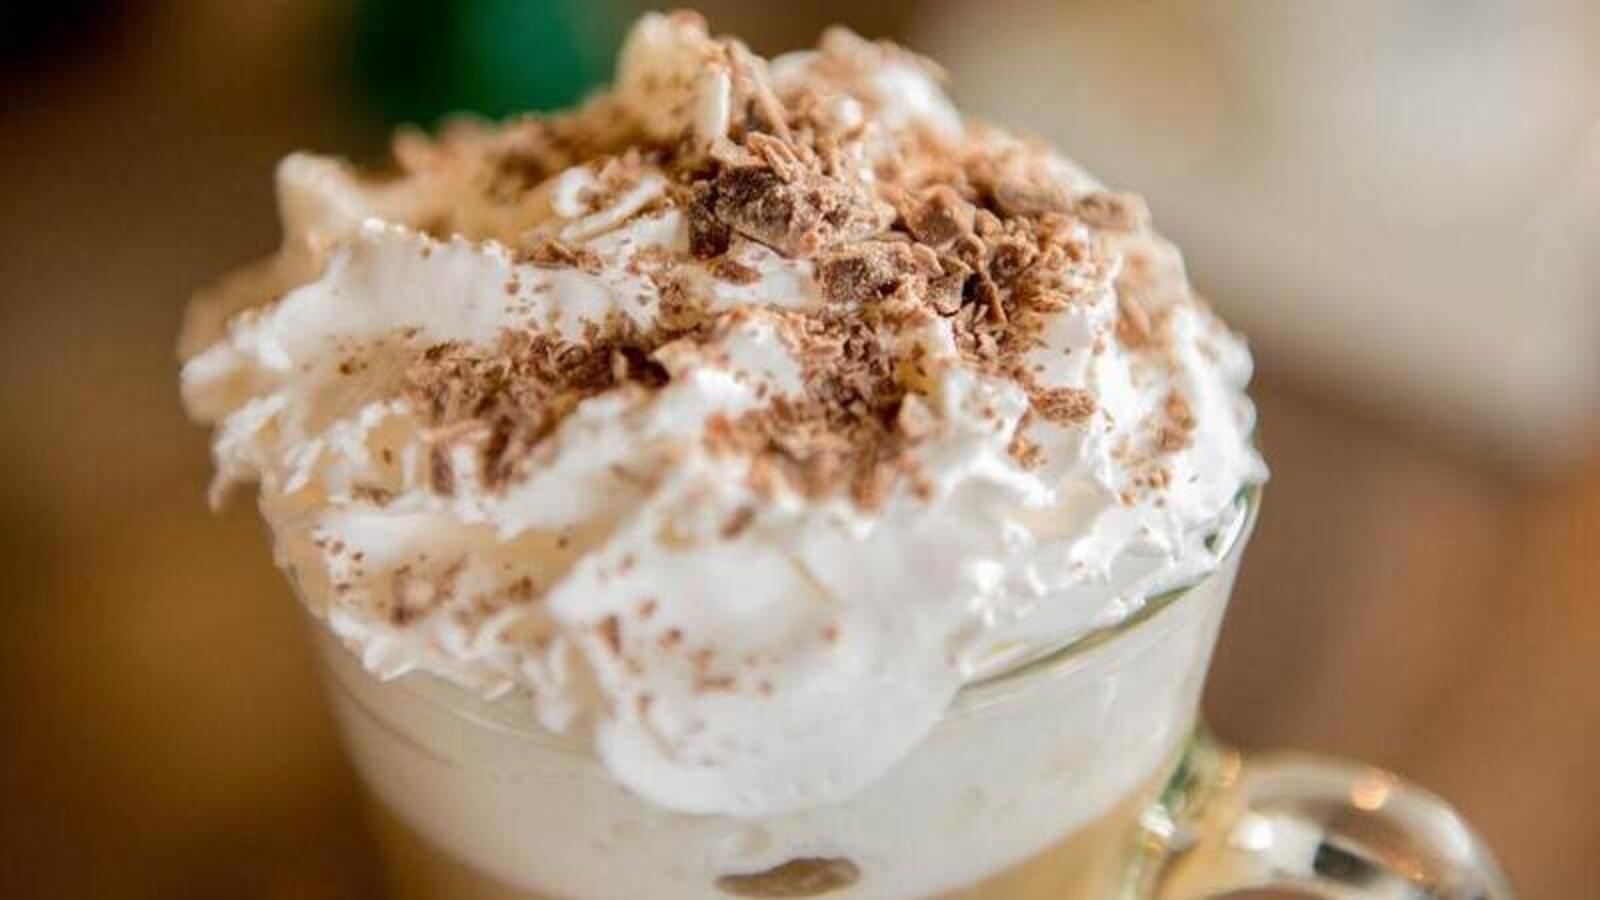 Pumpkin Spice Hot Chocolate - Featured Image 2